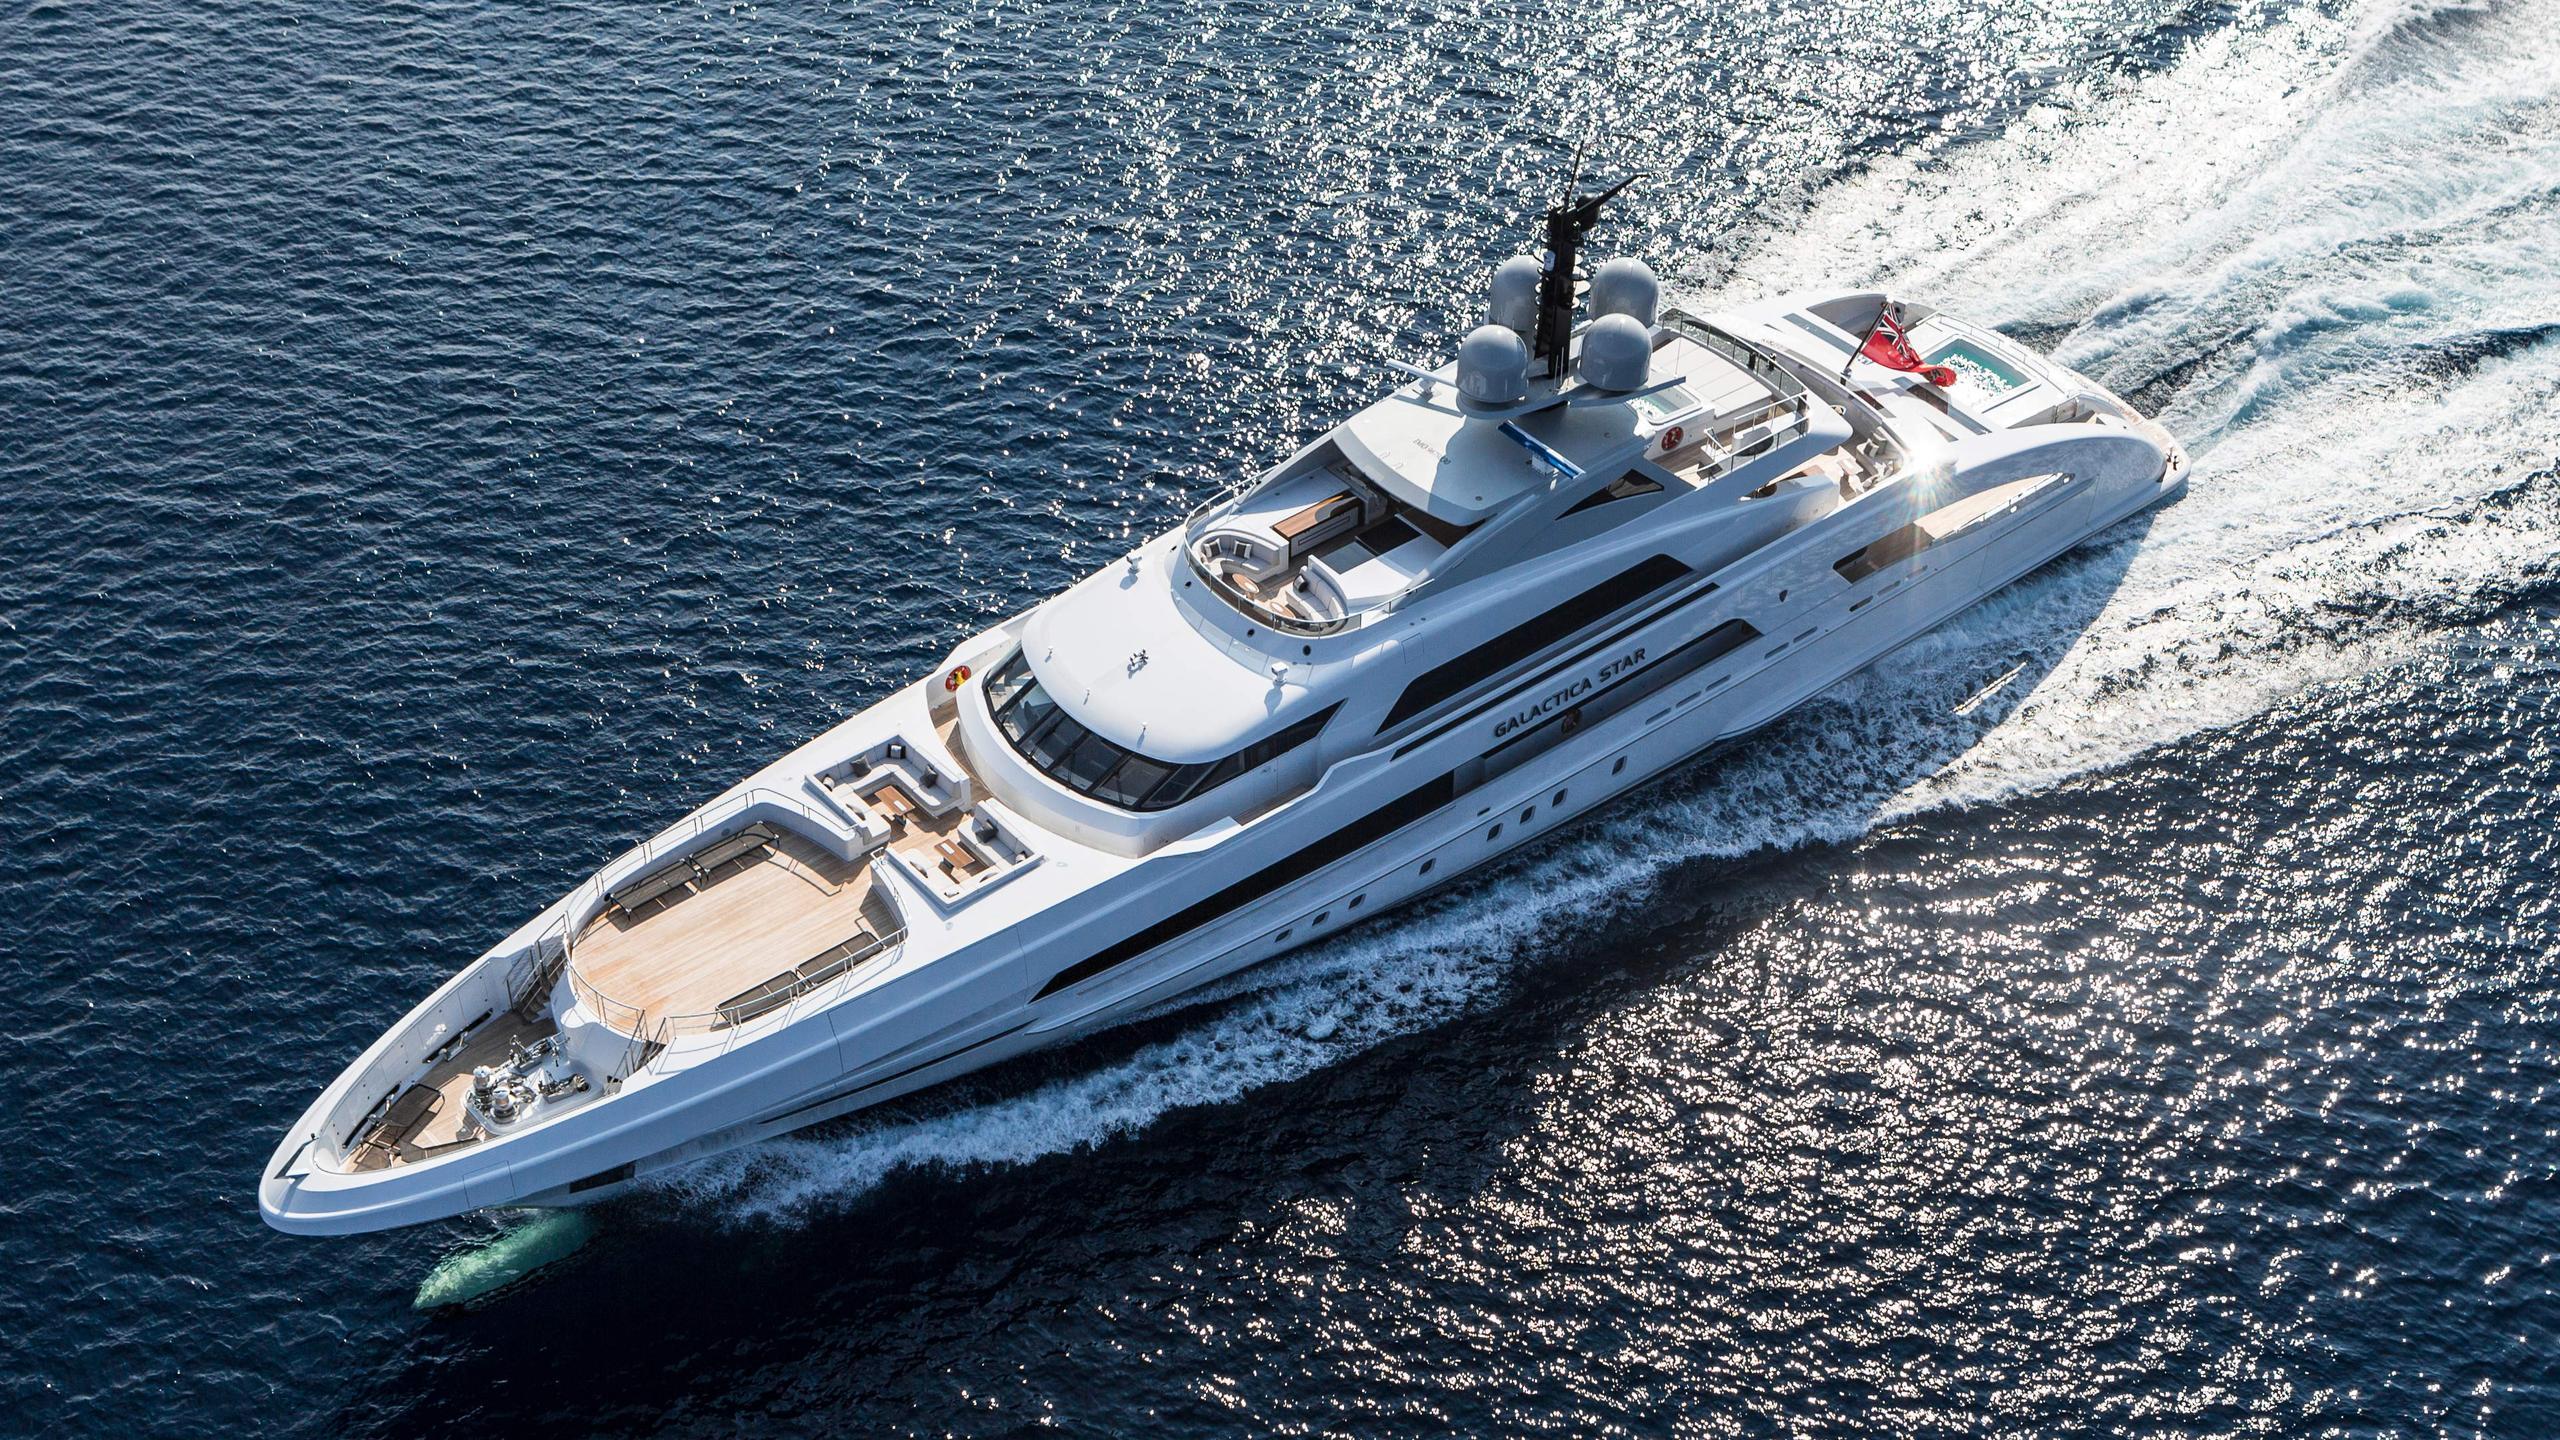 Galactica-Star-motor-yacht-heesen-2013-65m-aerial